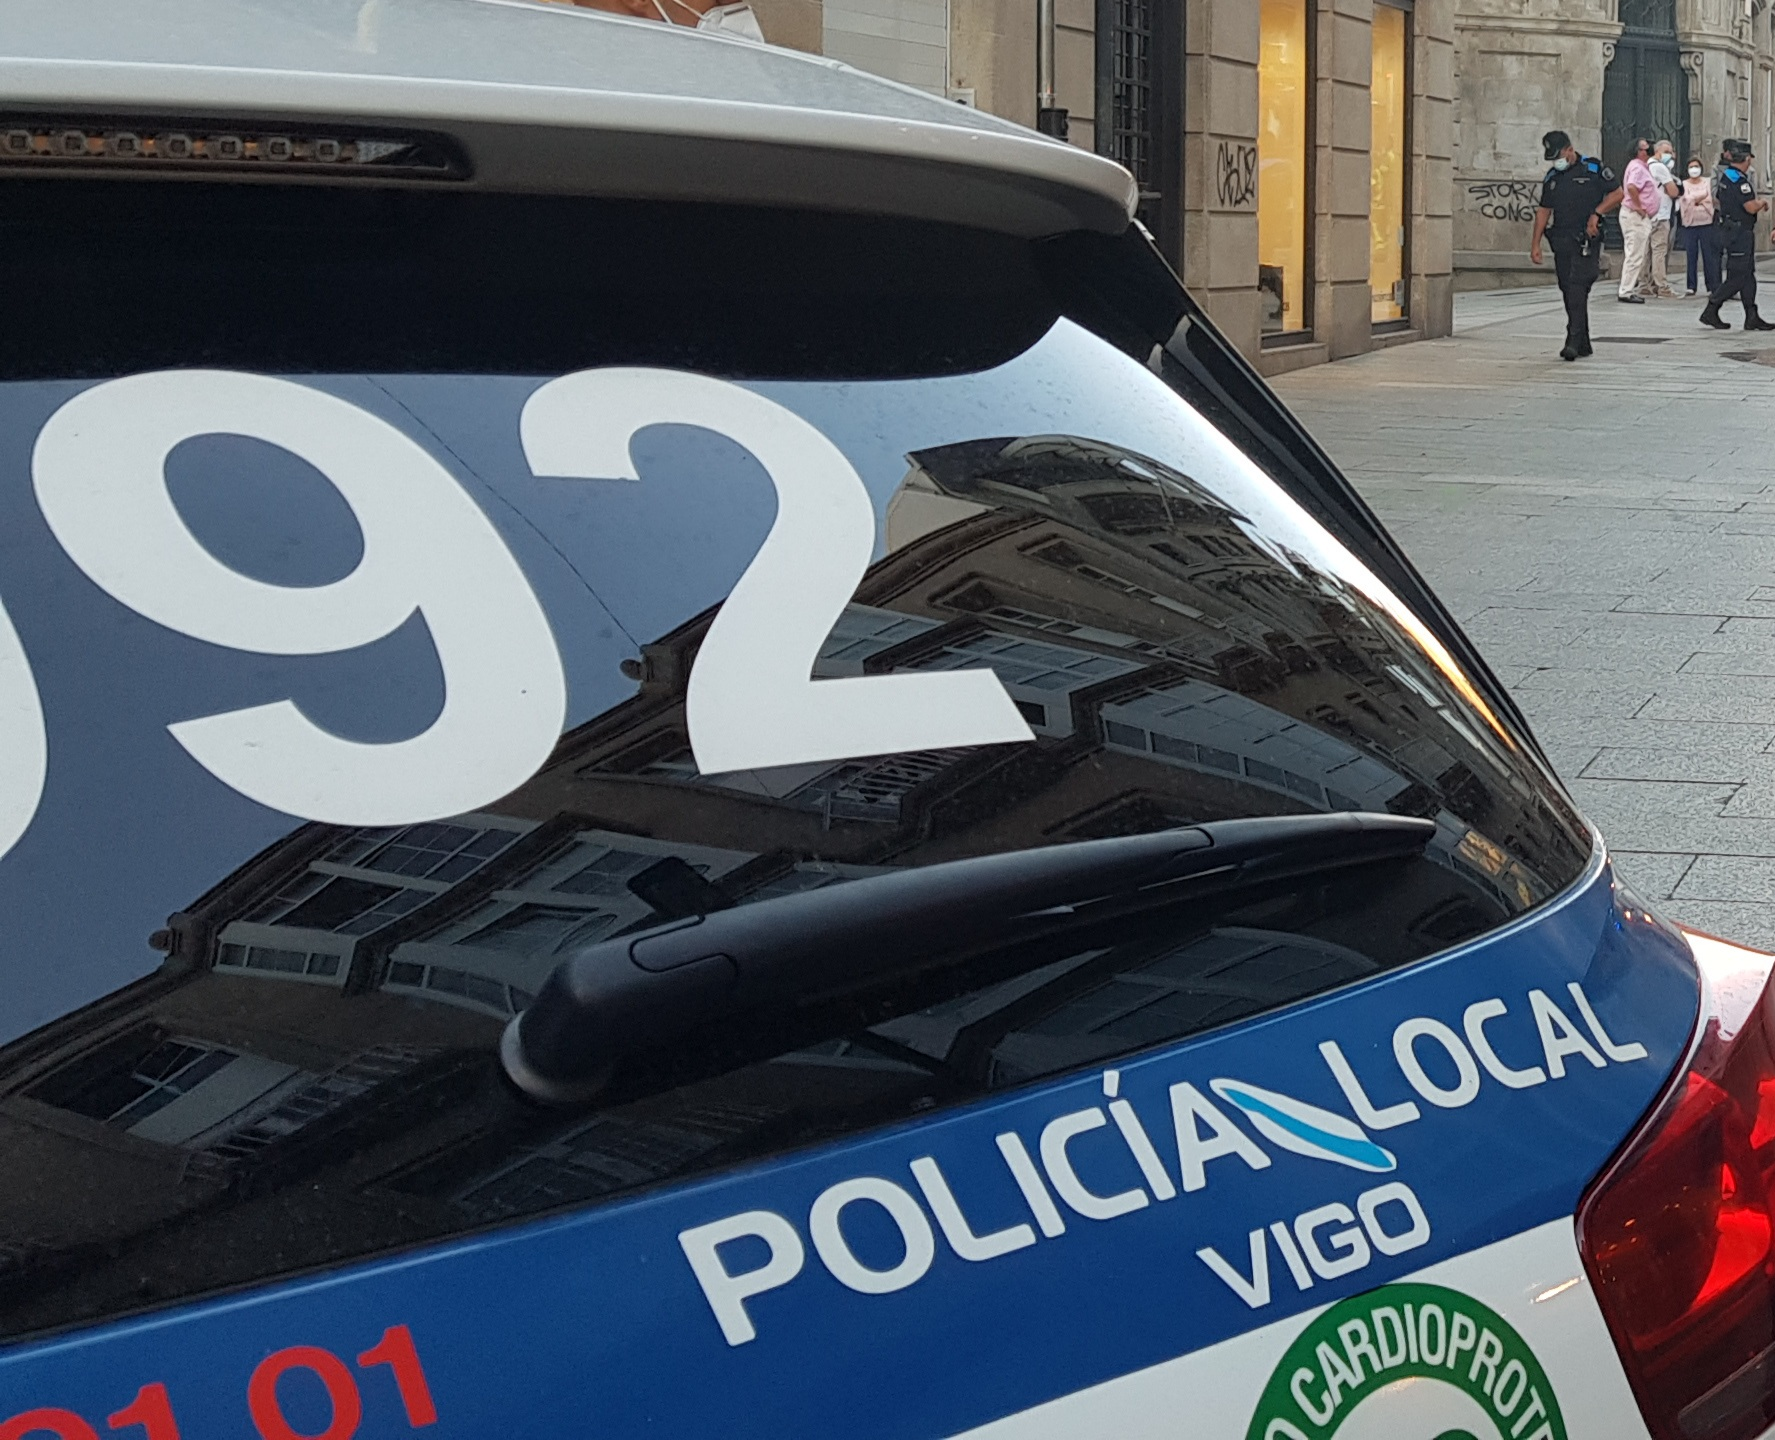 Policía Local de Vigo/ARCHIVO